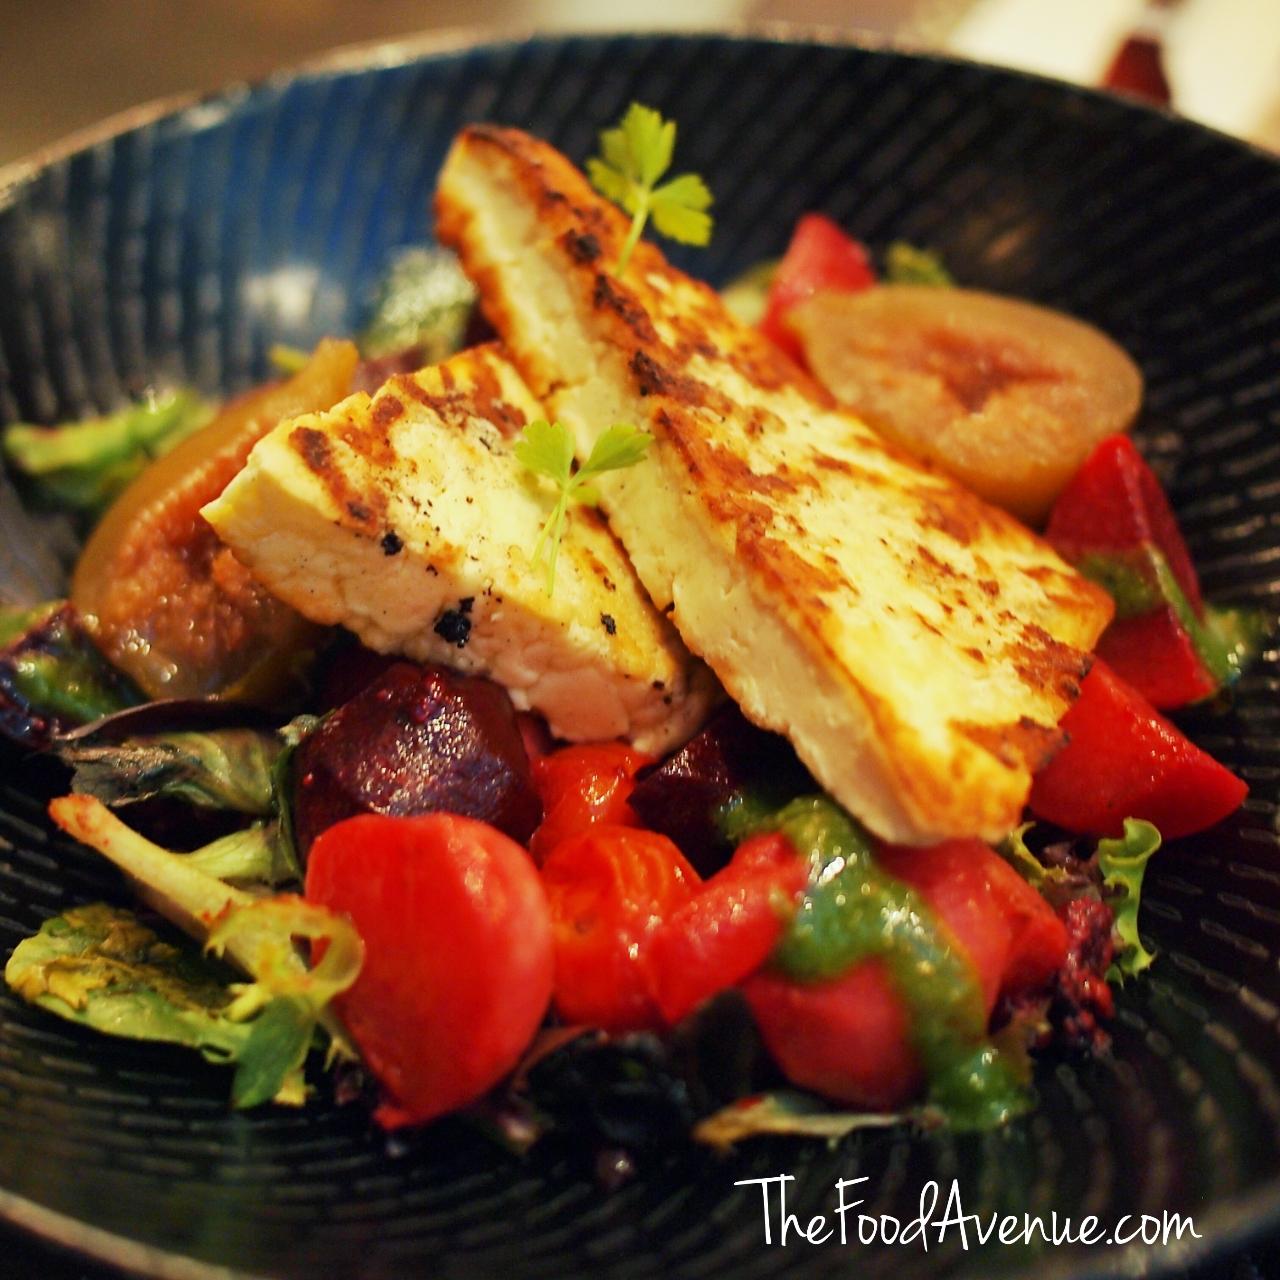 The_Food_Avenue_Black_Fire7